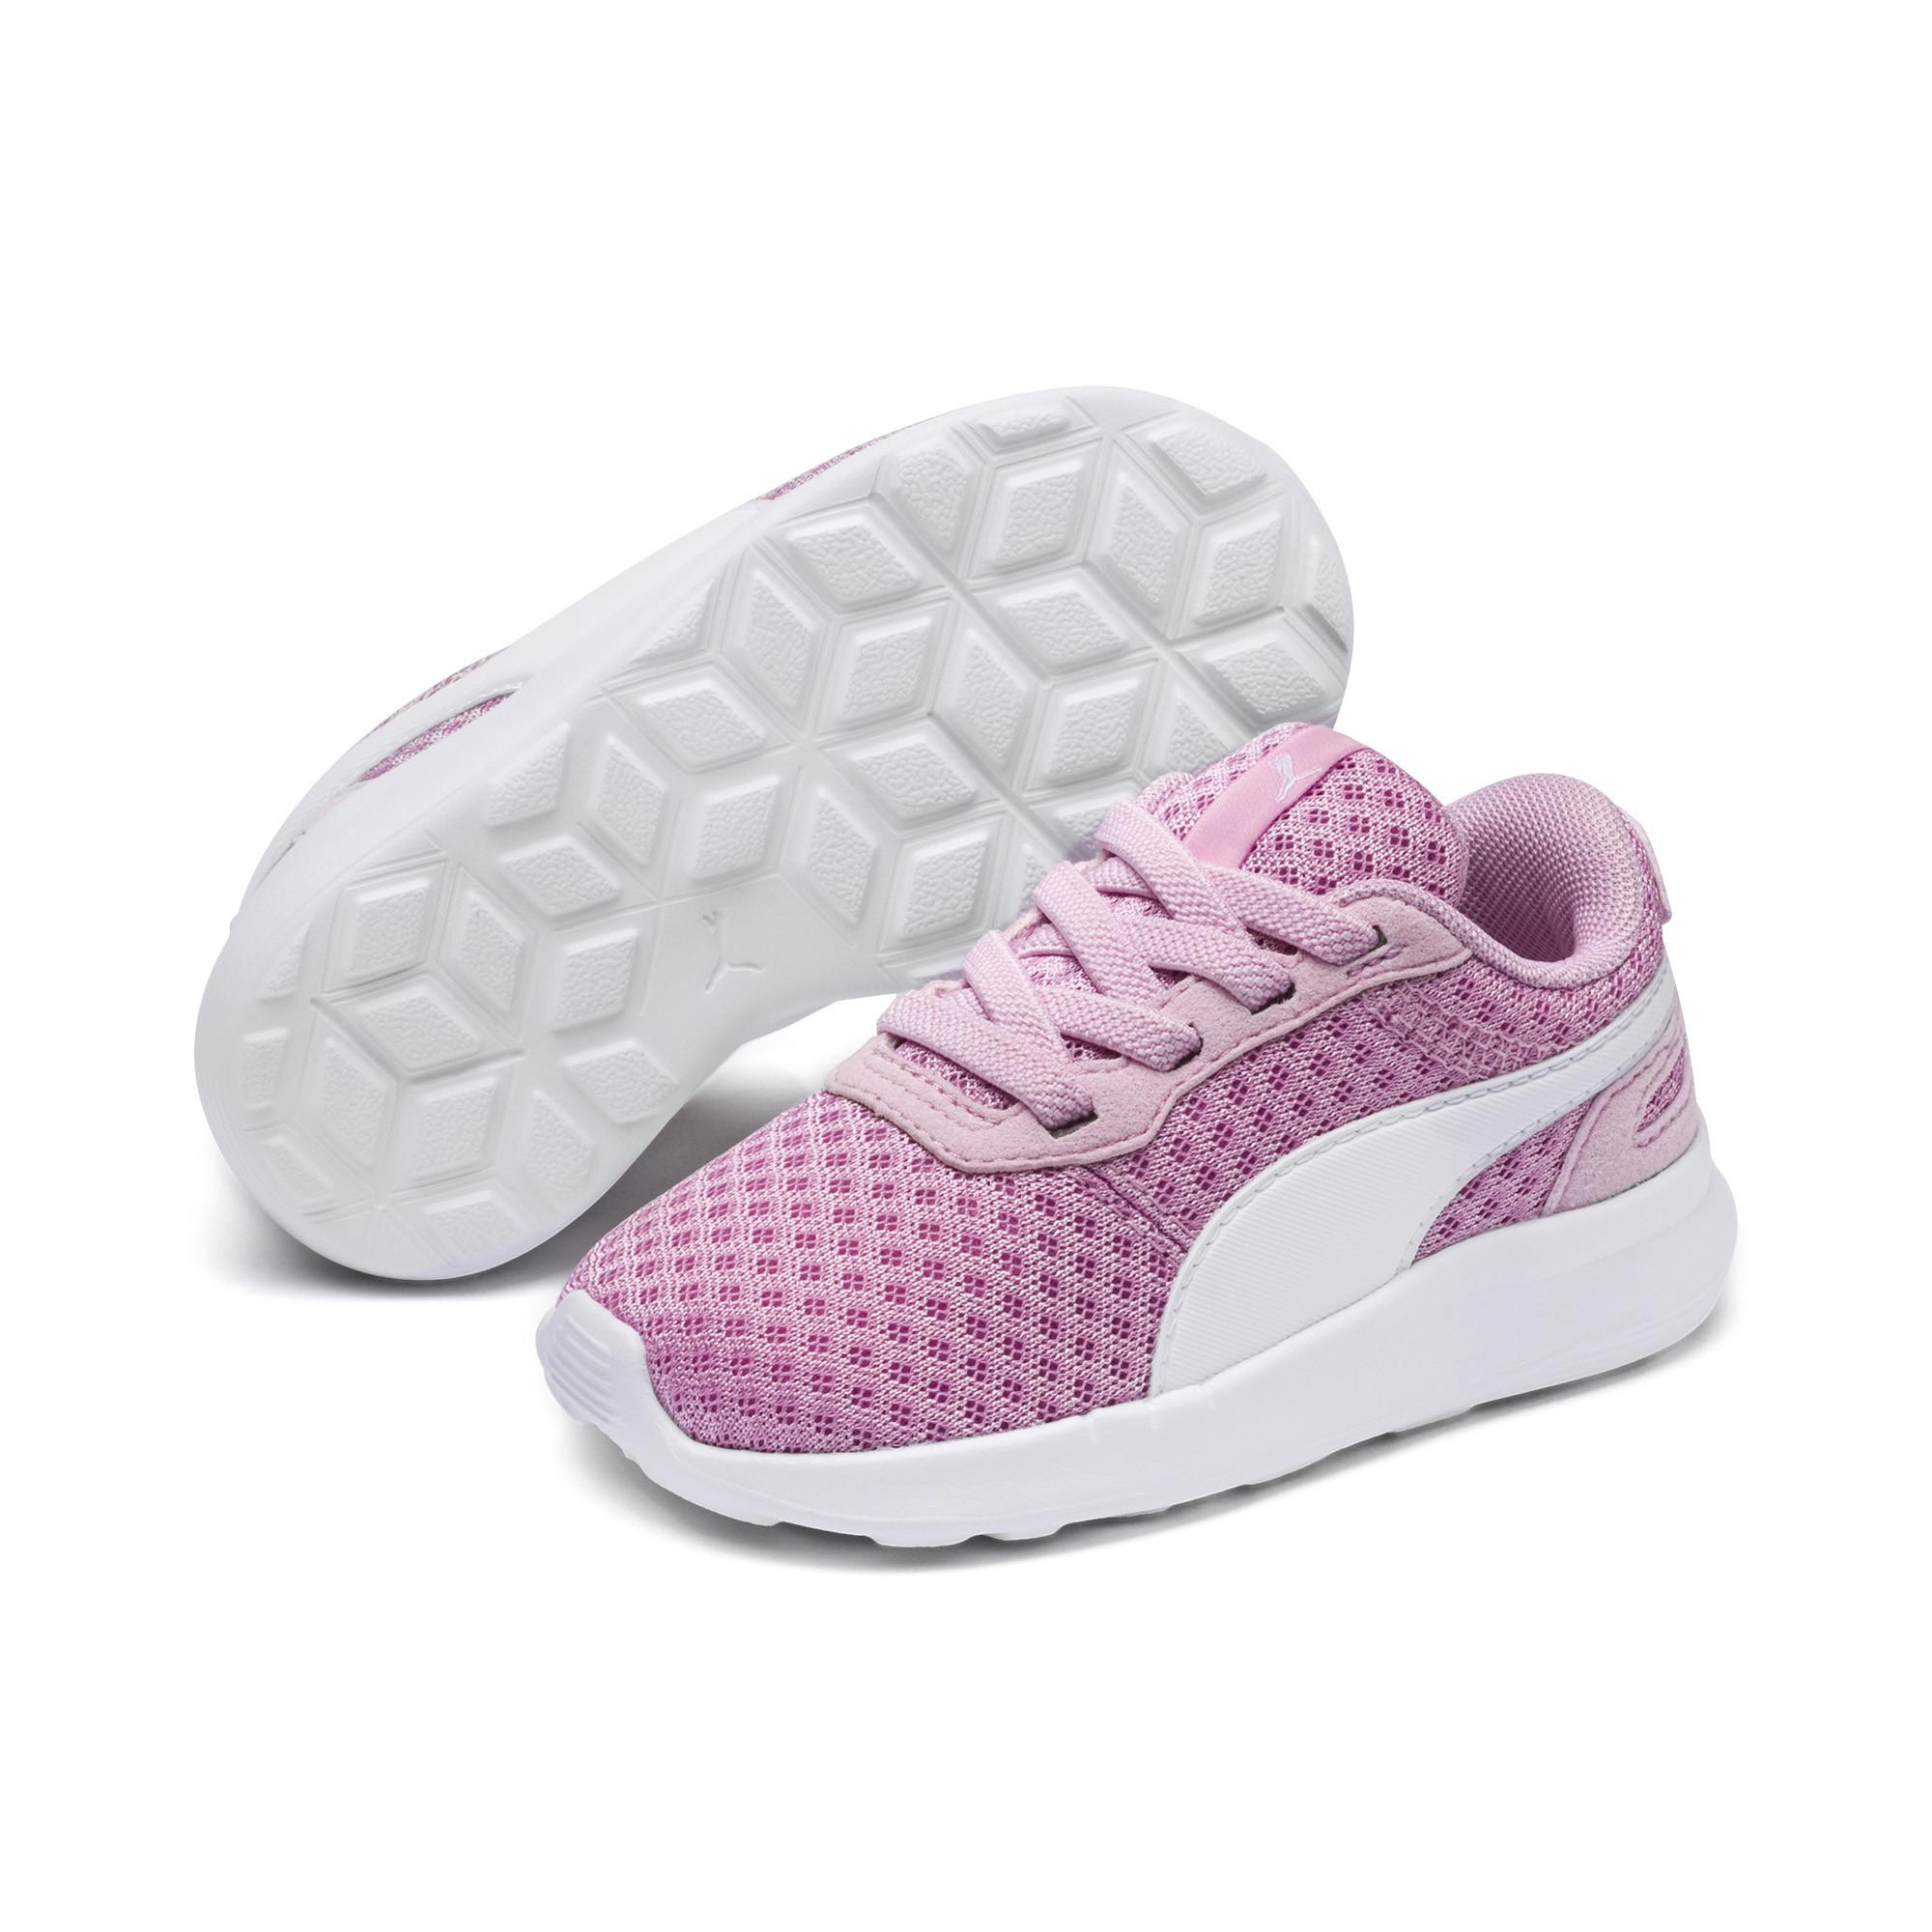 fea4401e02 PUMA ST Activate Babies' Trainers 369071